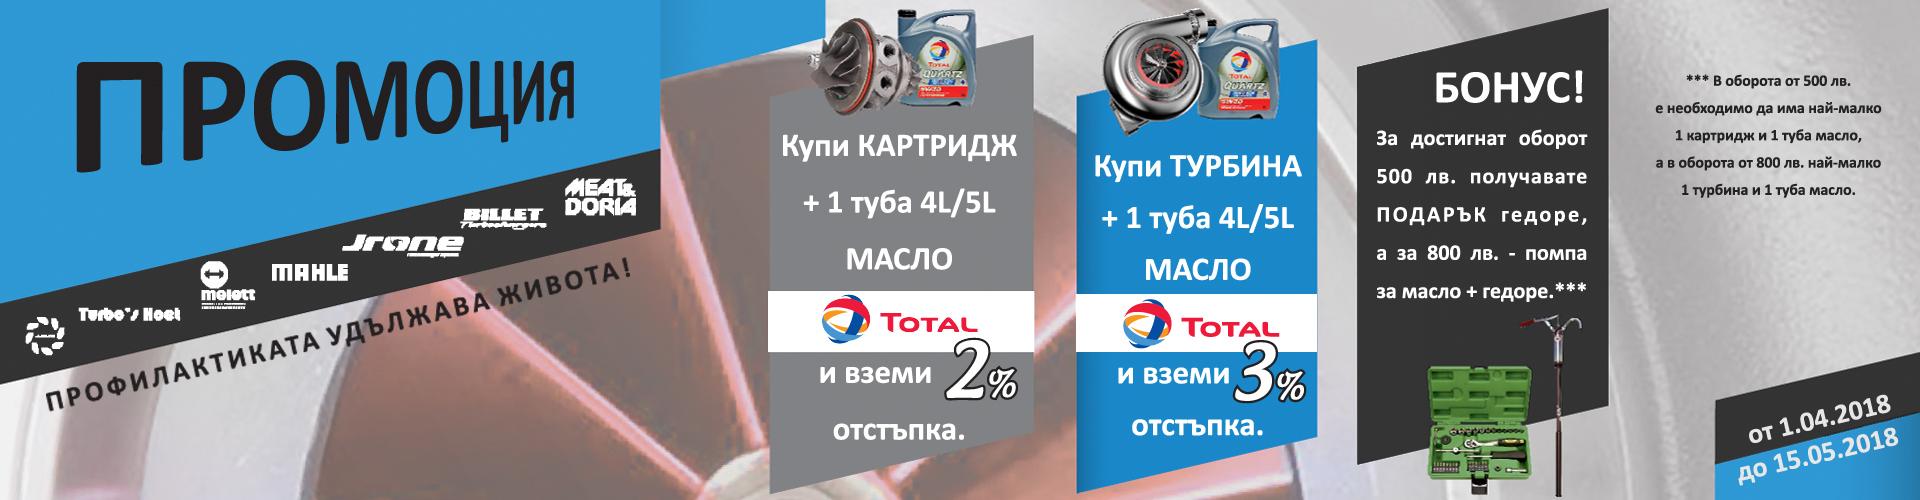 promo_turbini_total_2018_banner.jpg